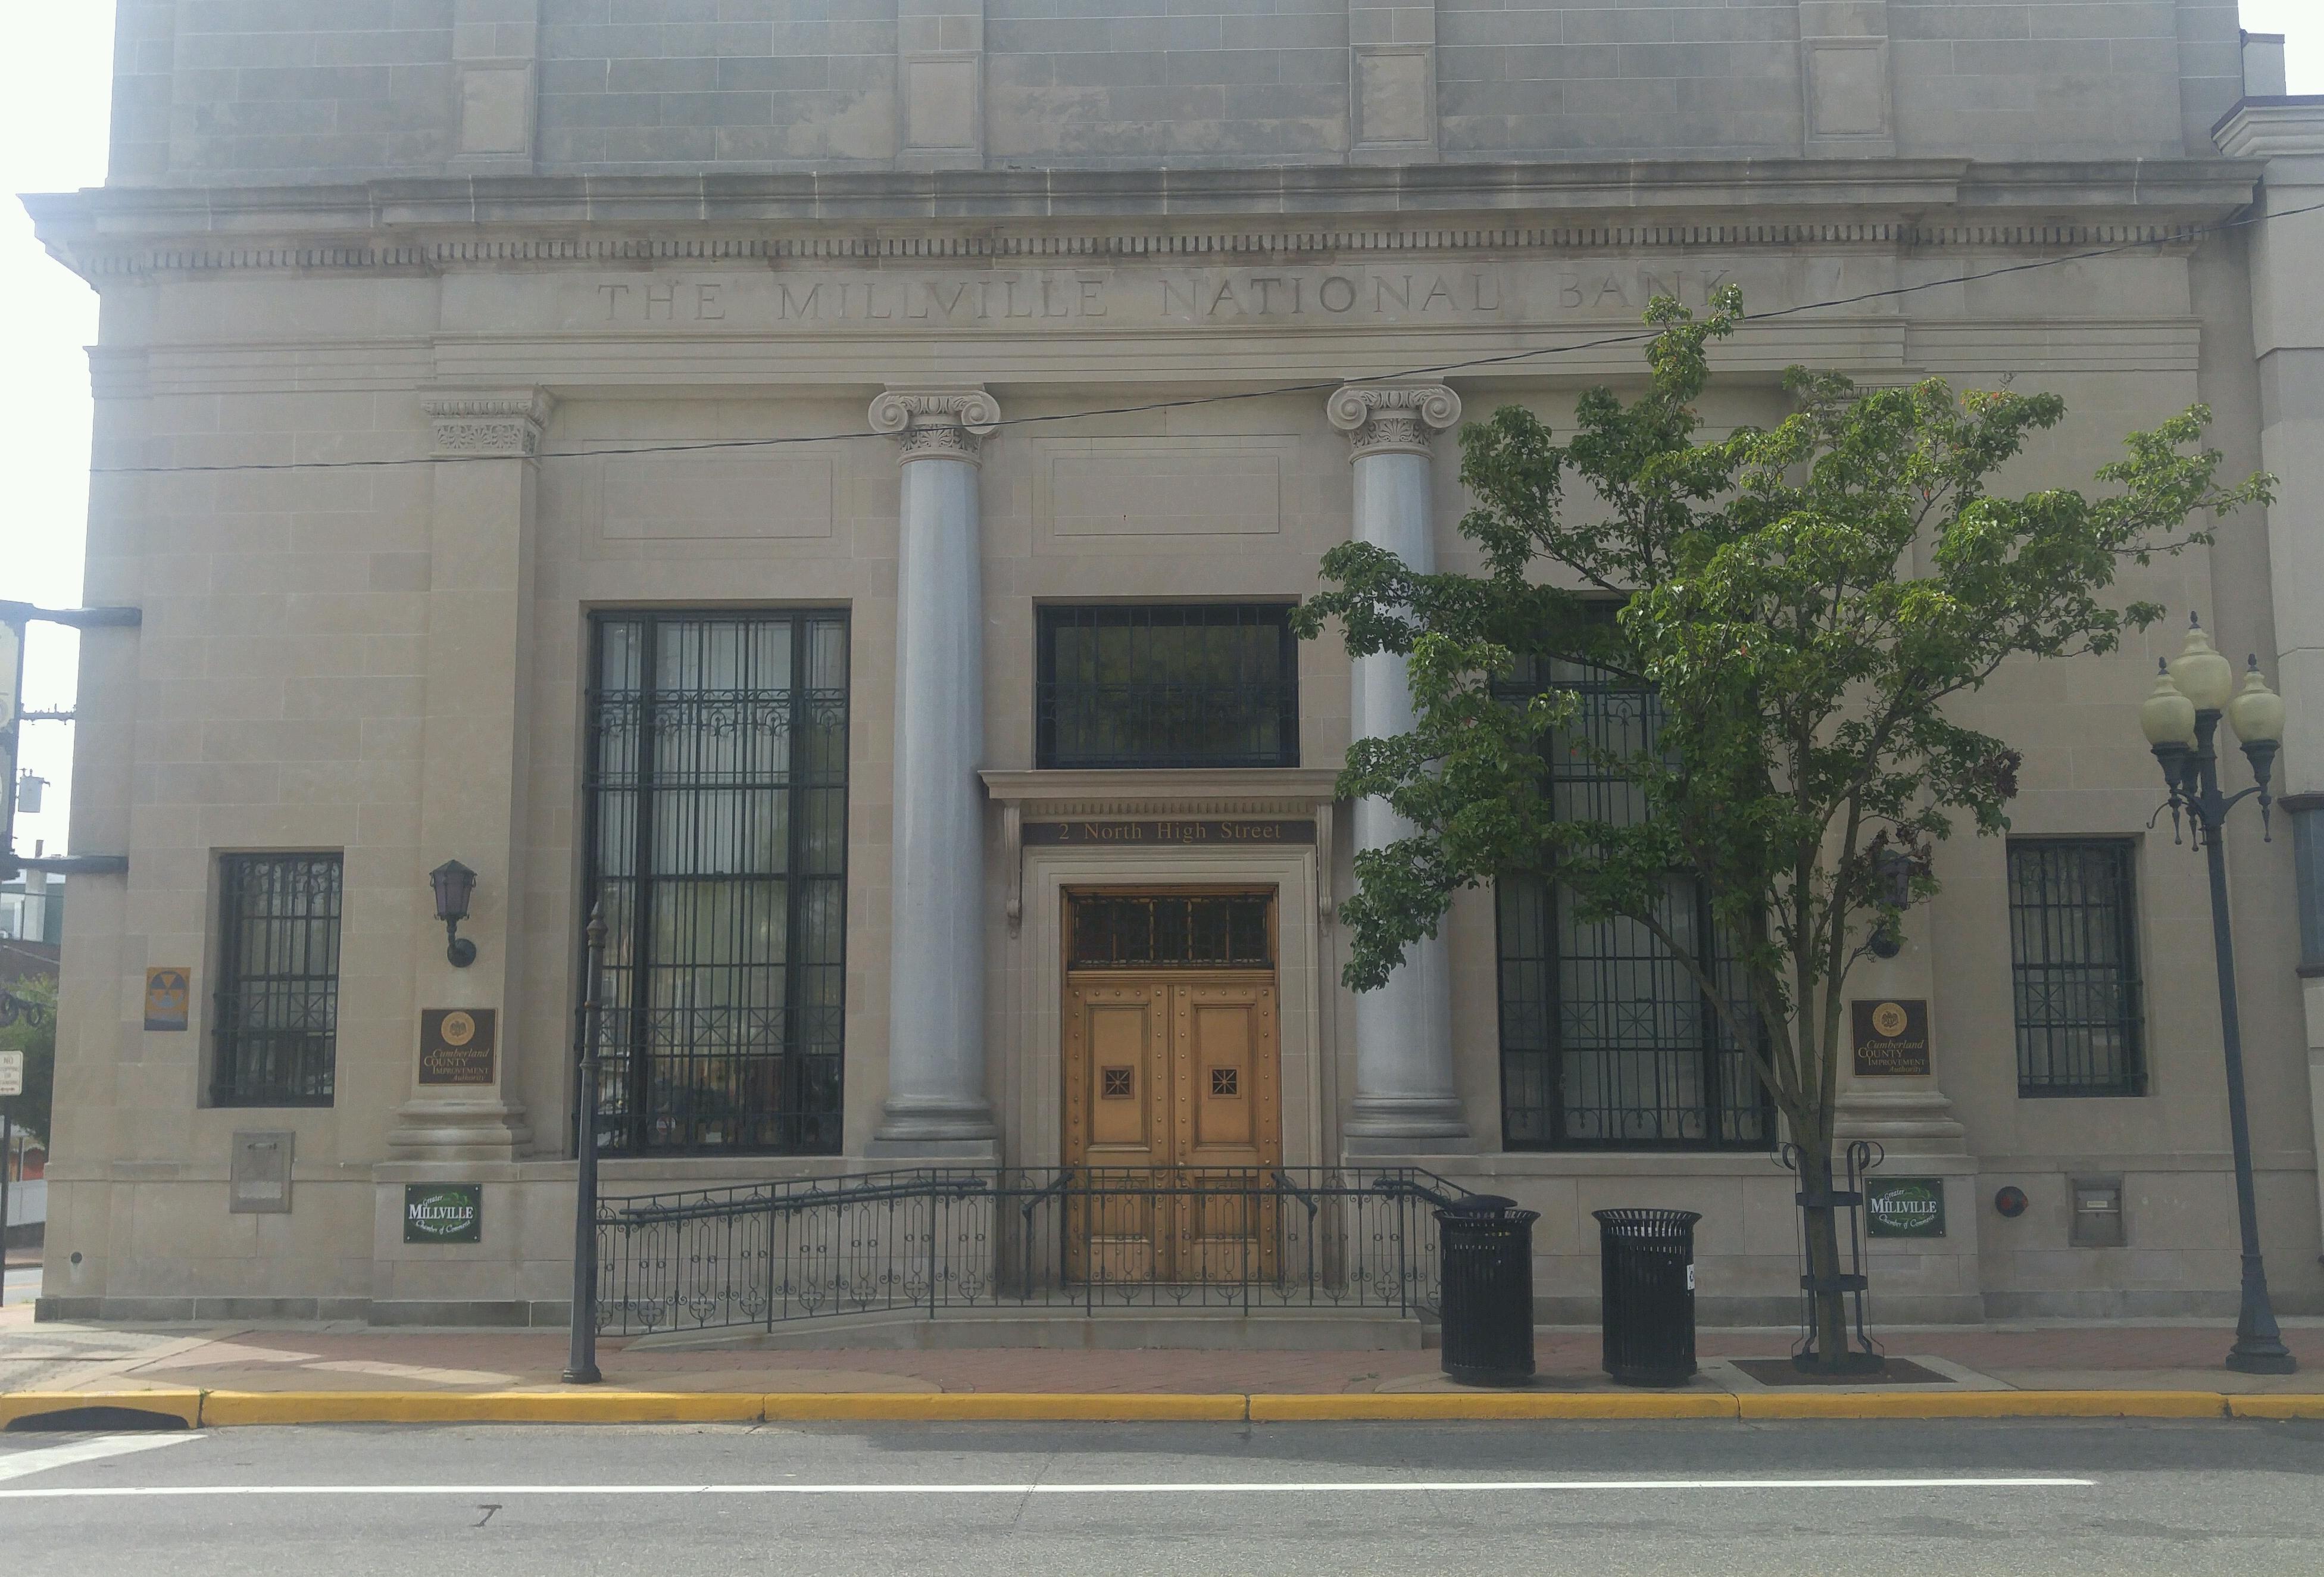 Cumberland County Improvement Authority Exterior Building Restoration & Facade Repairs